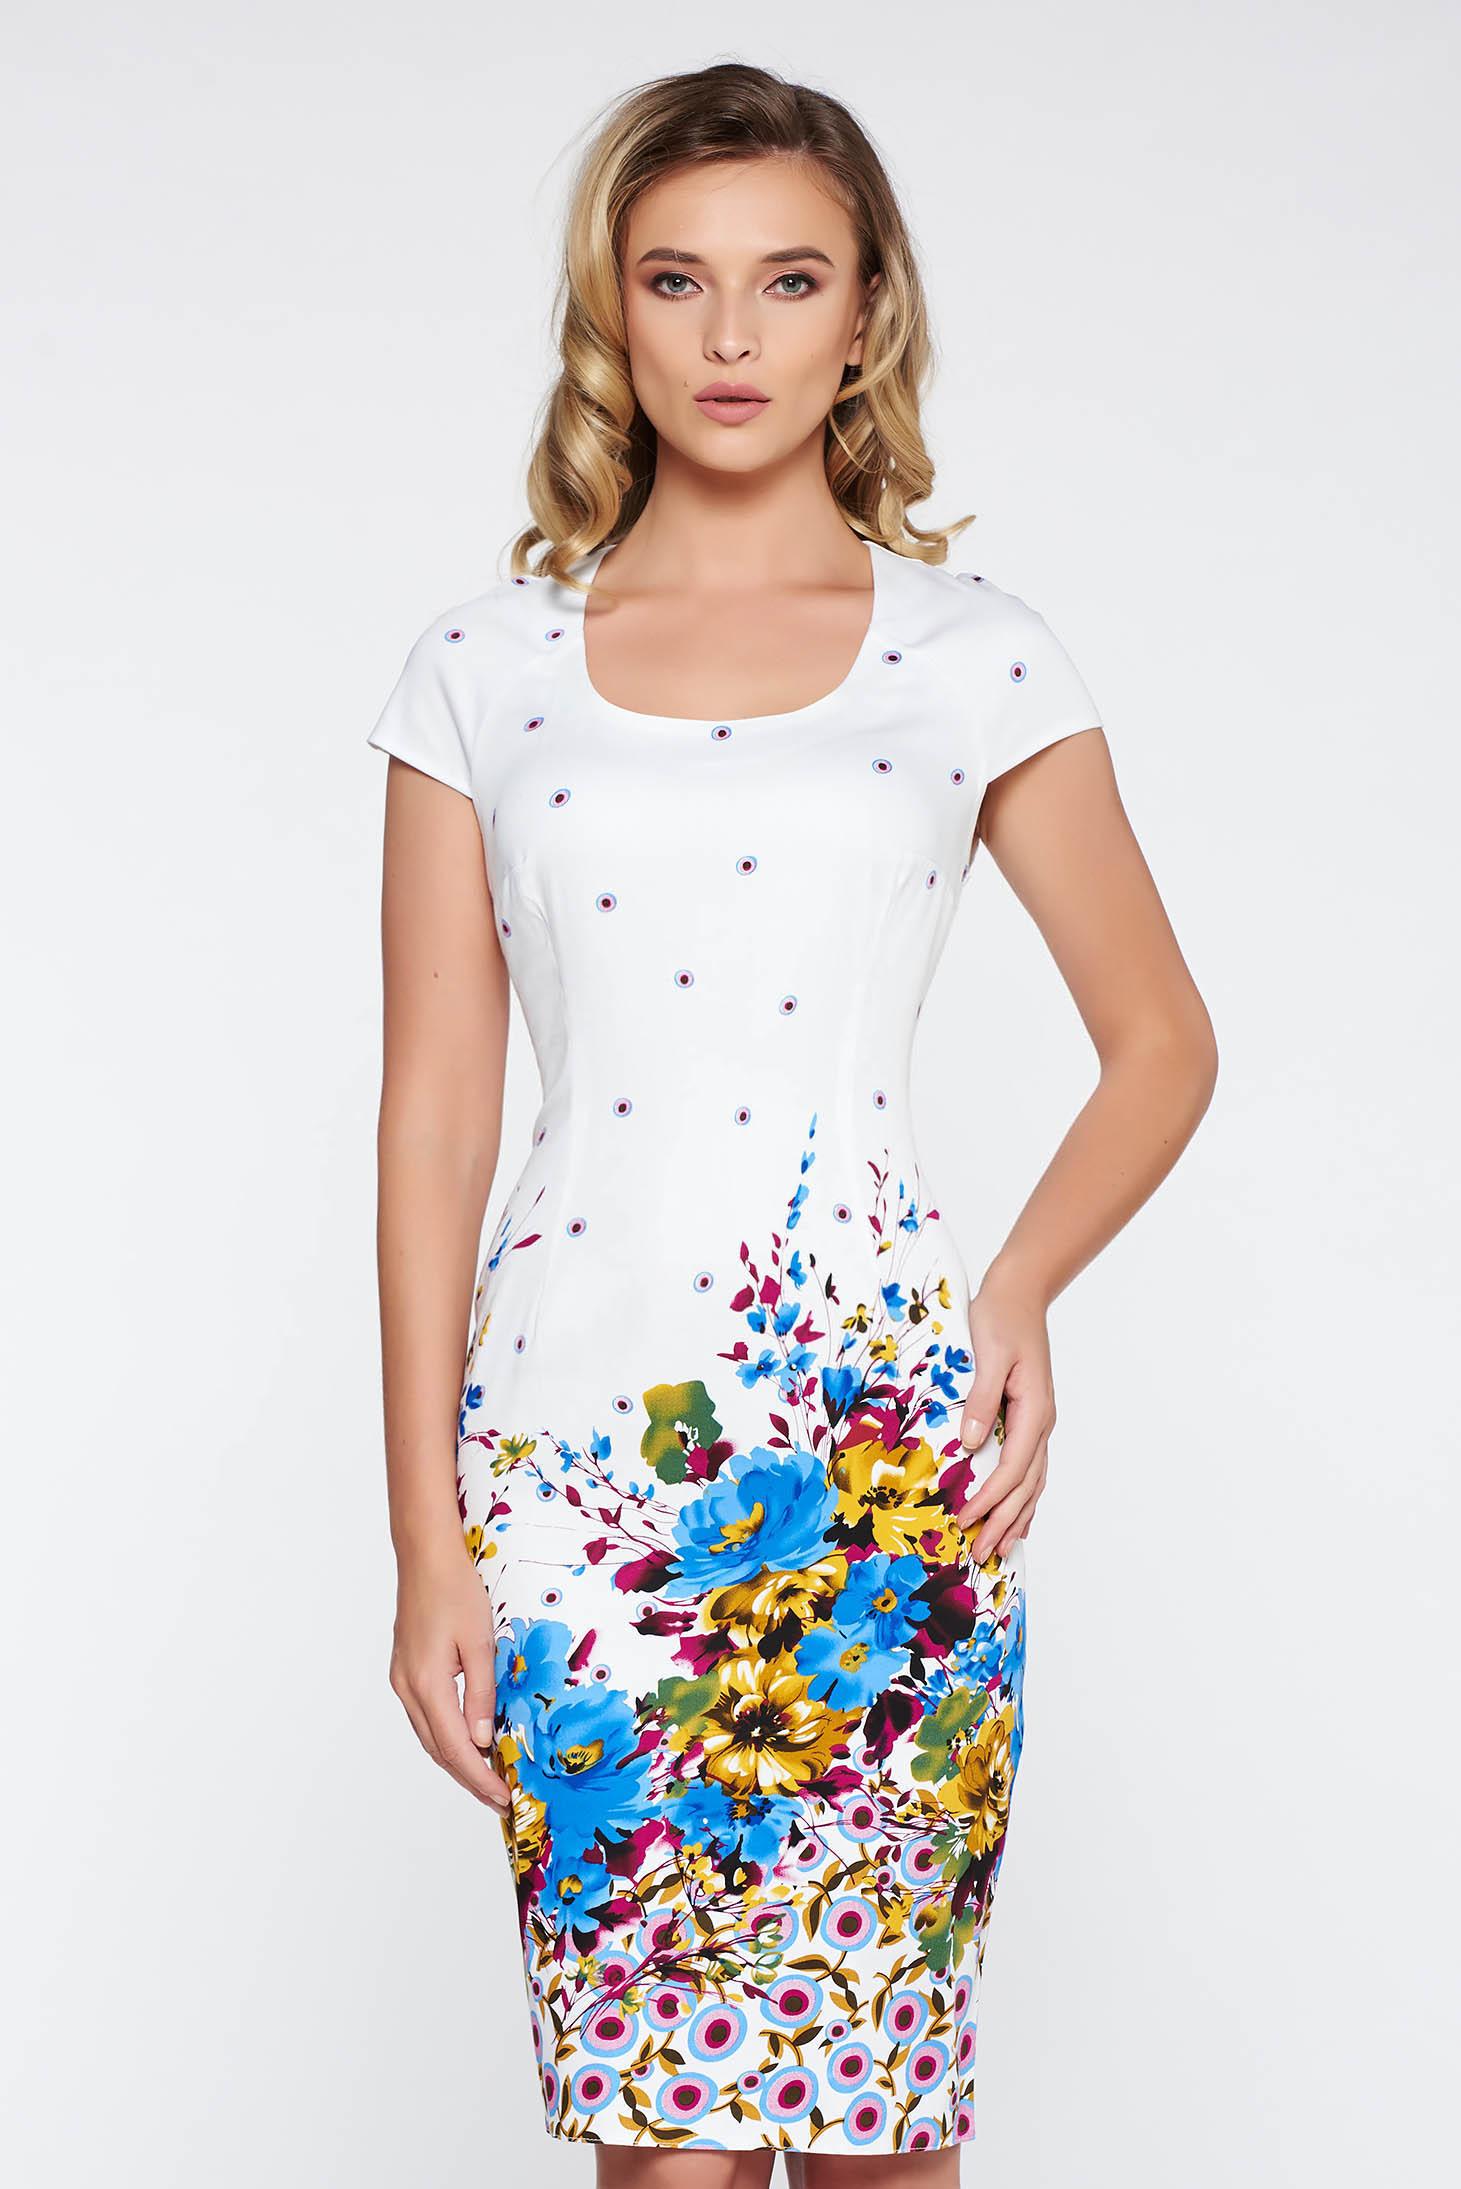 Rochie alba office midi tip creion din bumbac elastic cu imprimeuri florale